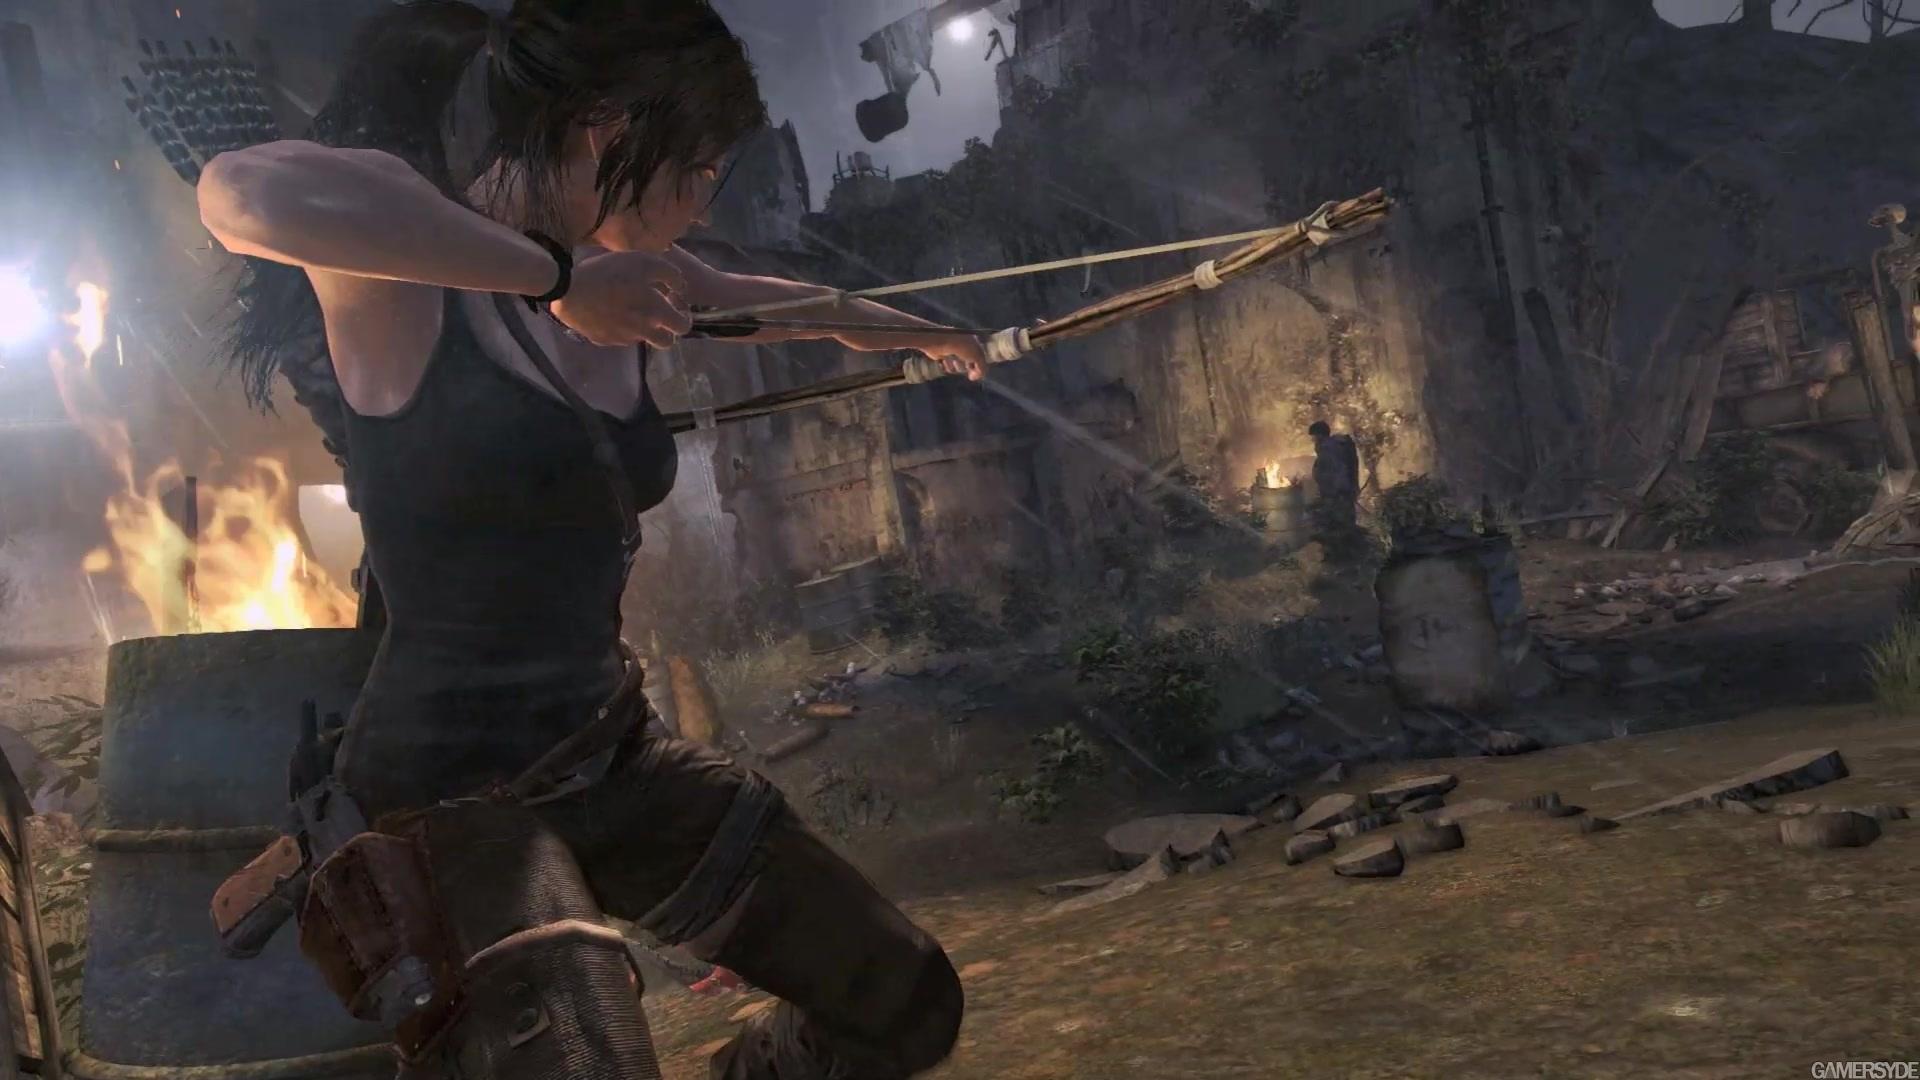 image tomb raider 24052 1912 0009 تصاویر جدیدی از عنوان Tomb Raider: Definitive Edition منتشر شد